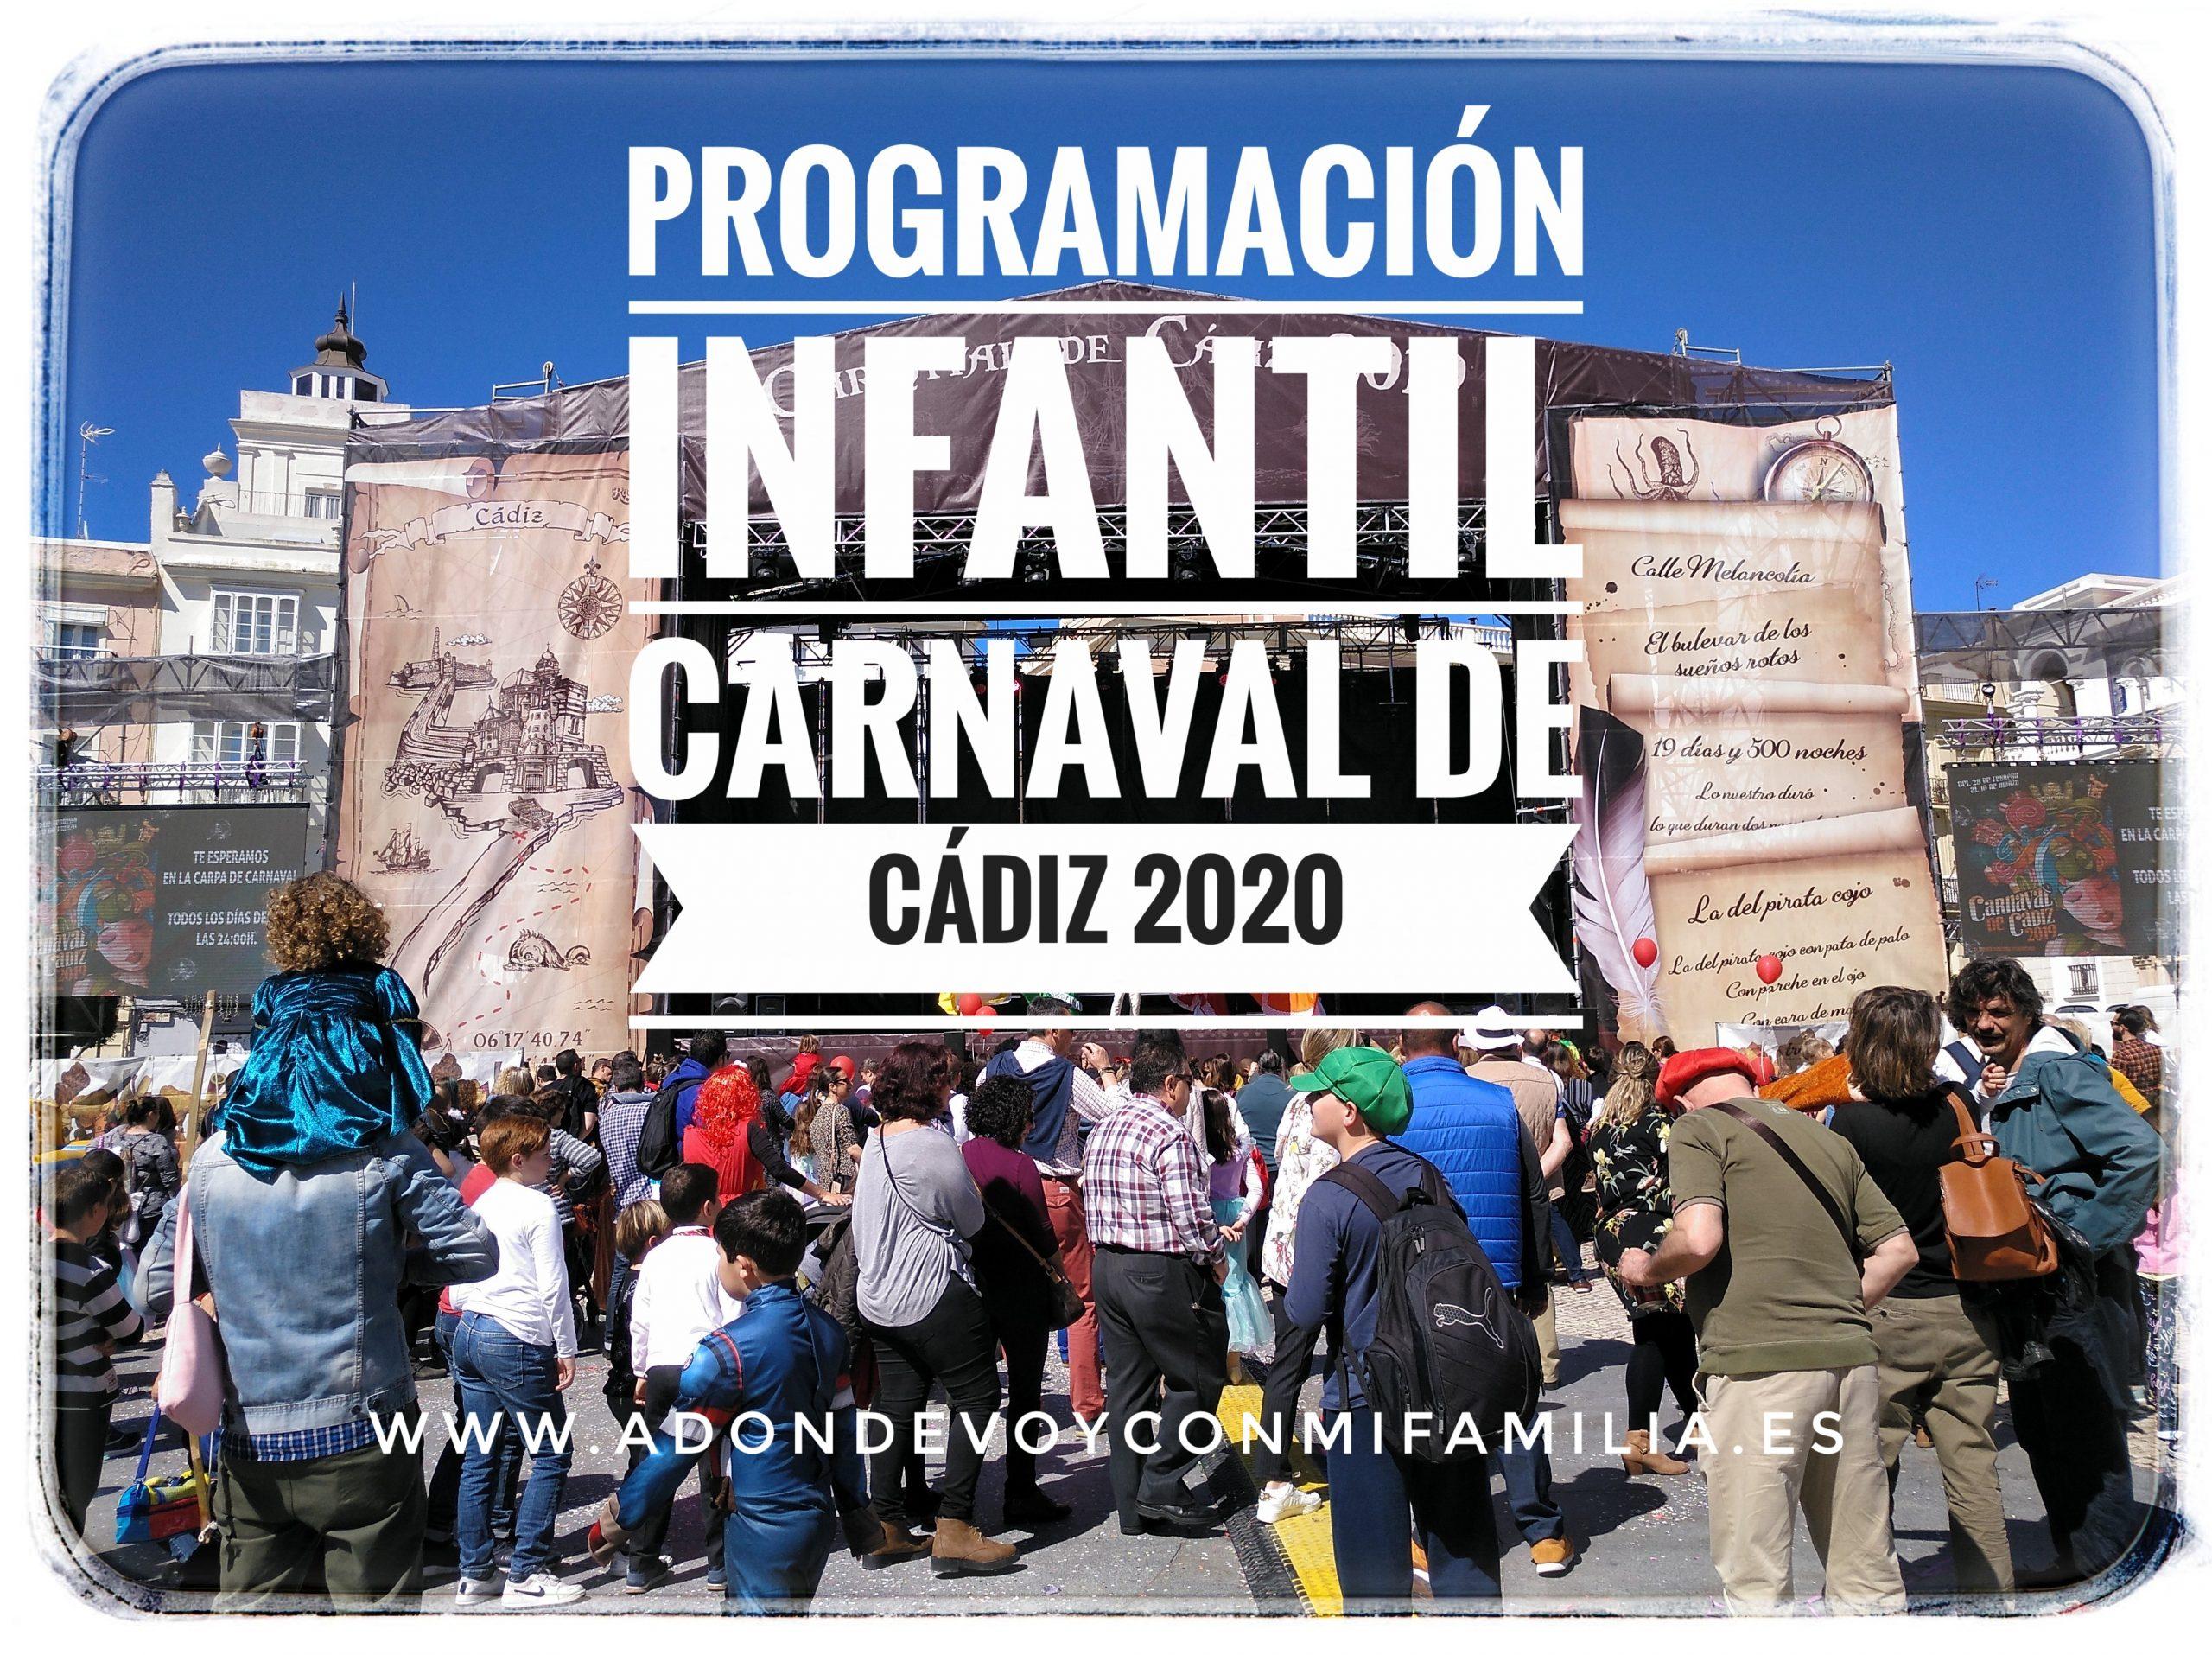 PROGRAMACIÓN INFANTIL CARNAVAL DE CADIZ 2020